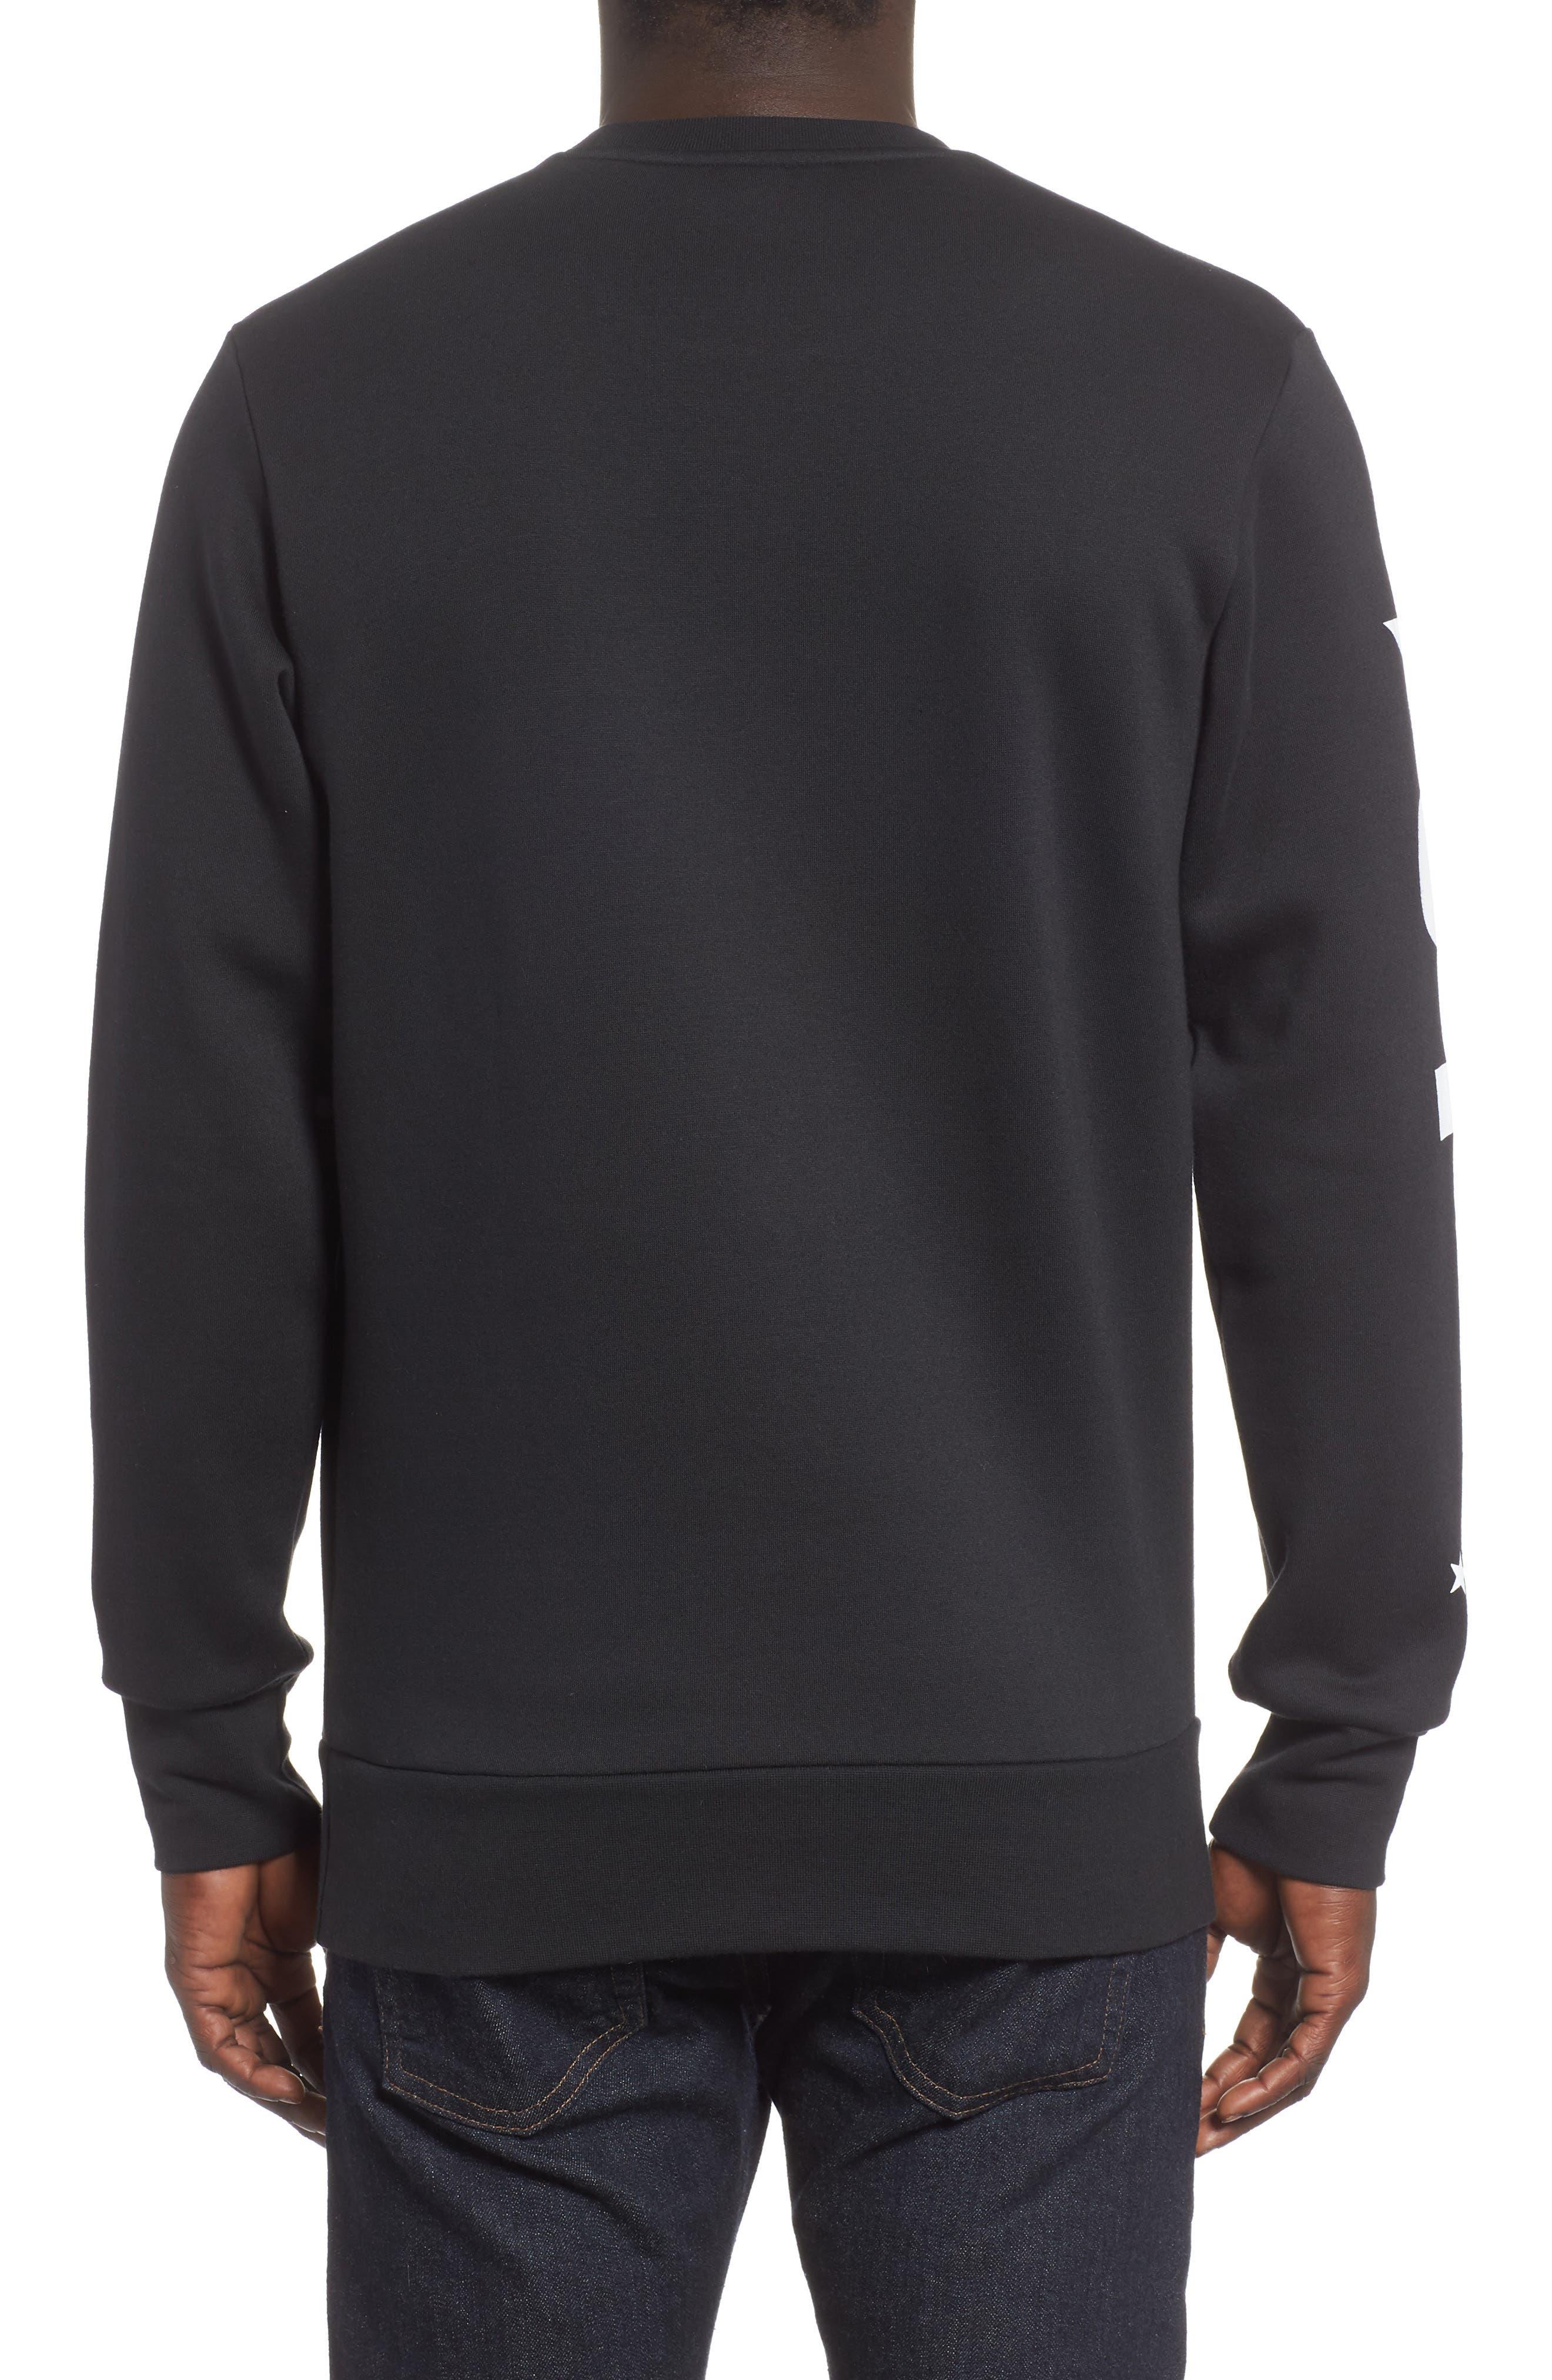 International Regular Fit Sweatshirt,                             Alternate thumbnail 2, color,                             BLACK